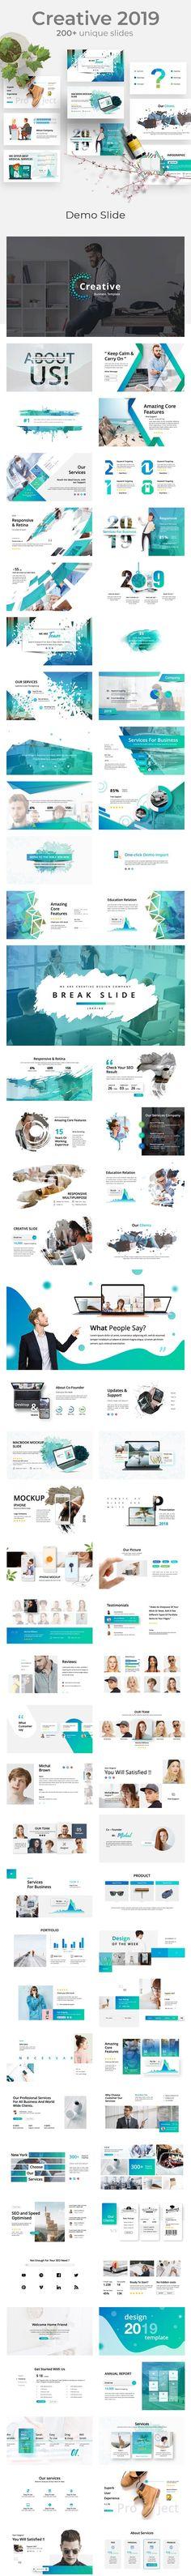 Business Presentation, Presentation Design, Presentation Templates, Presentation Slides, Creative Powerpoint Templates, Powerpoint Design, Broken Images, Creative Visualization, Business Proposal